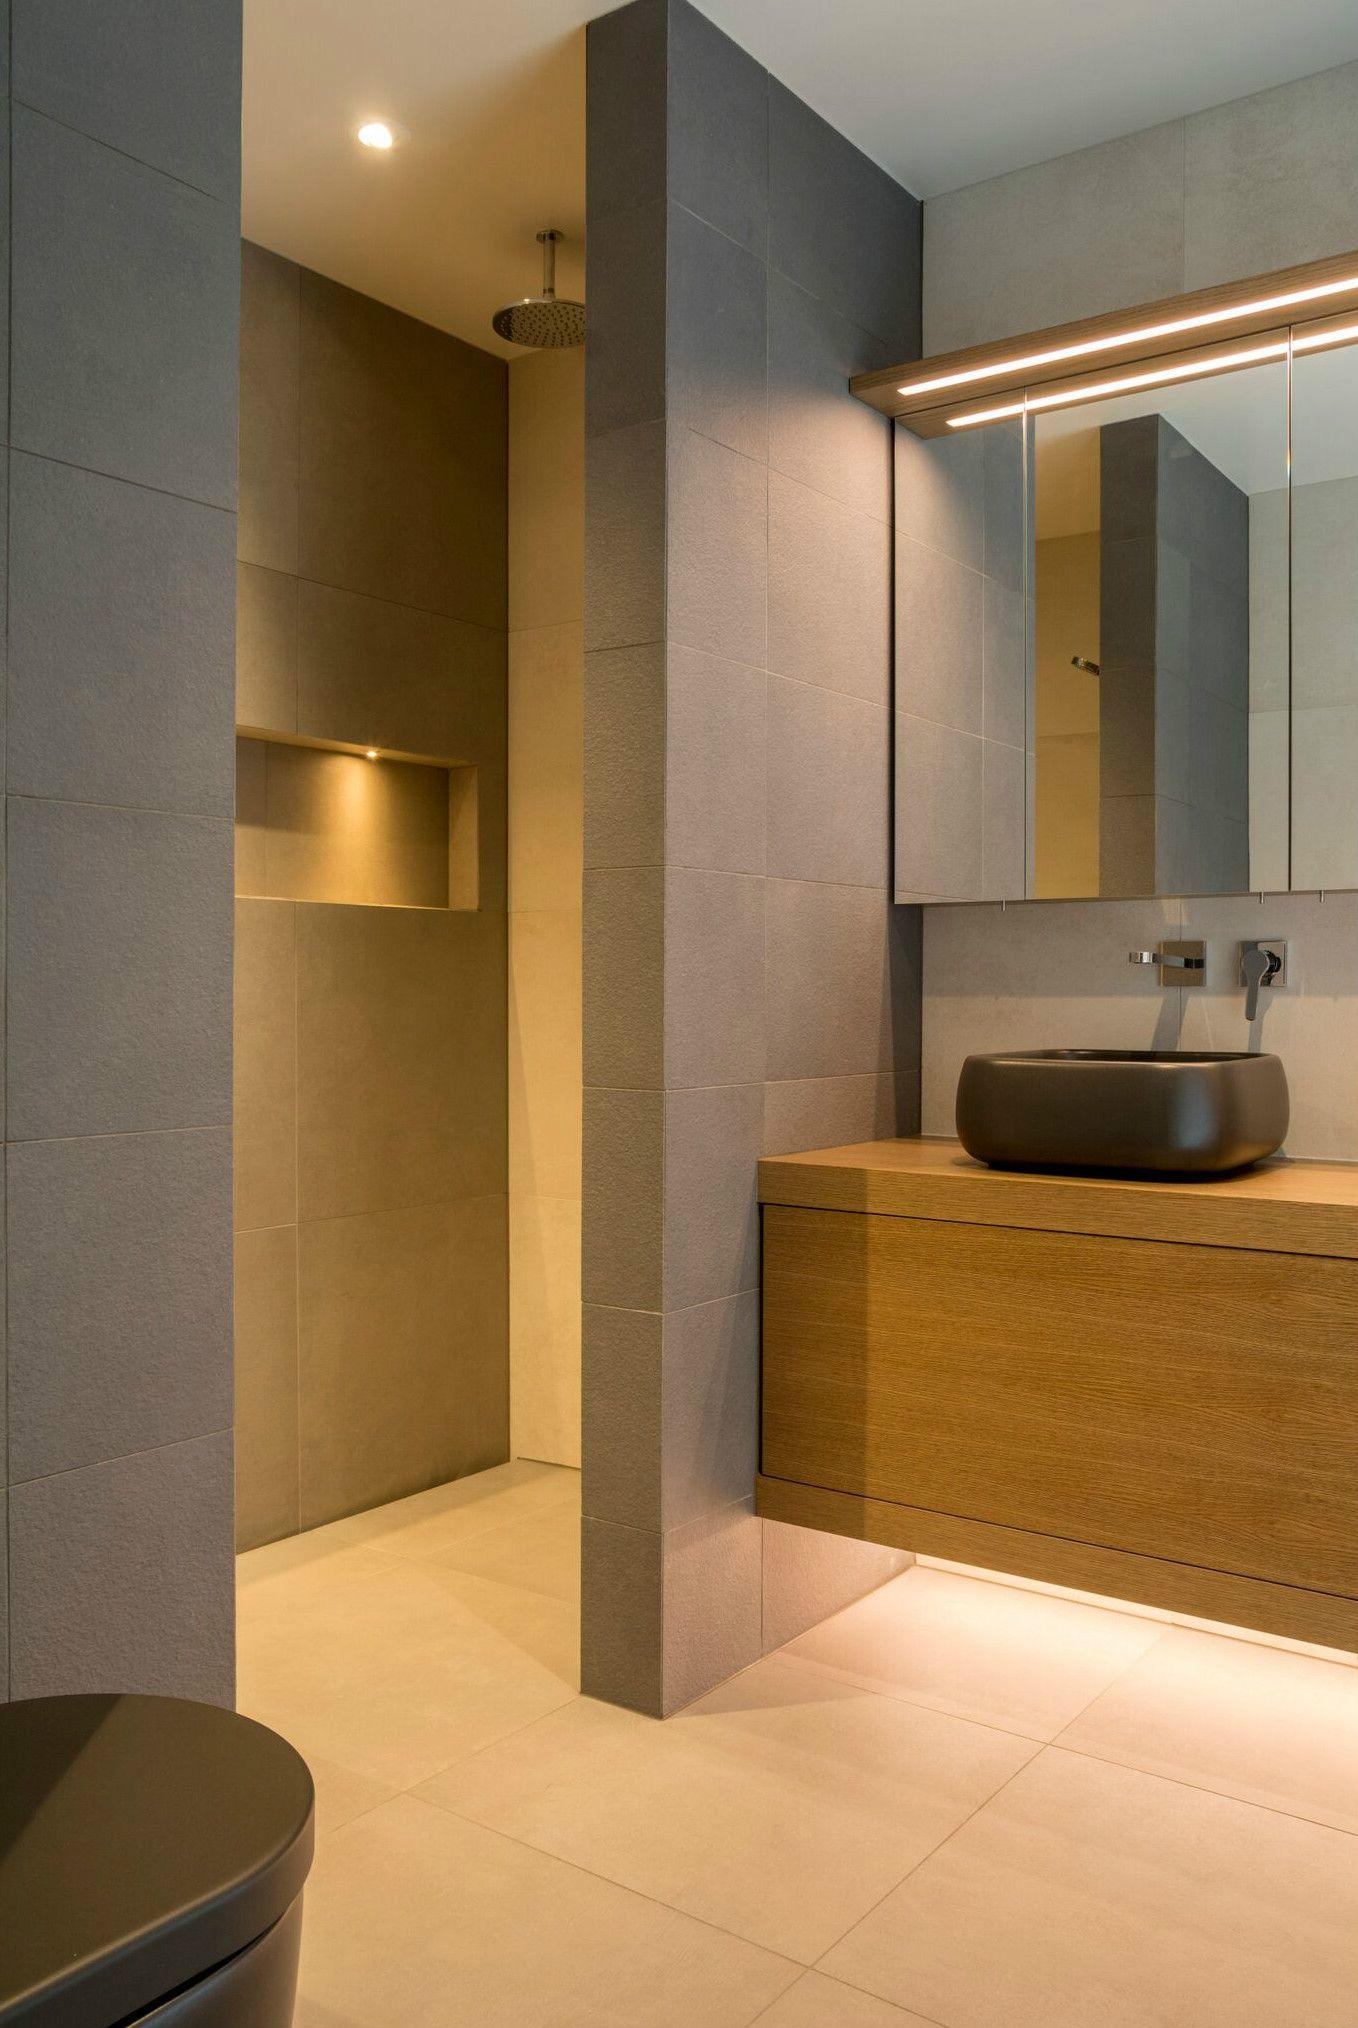 Surface Design - Nelson bathroom design, tiles ...